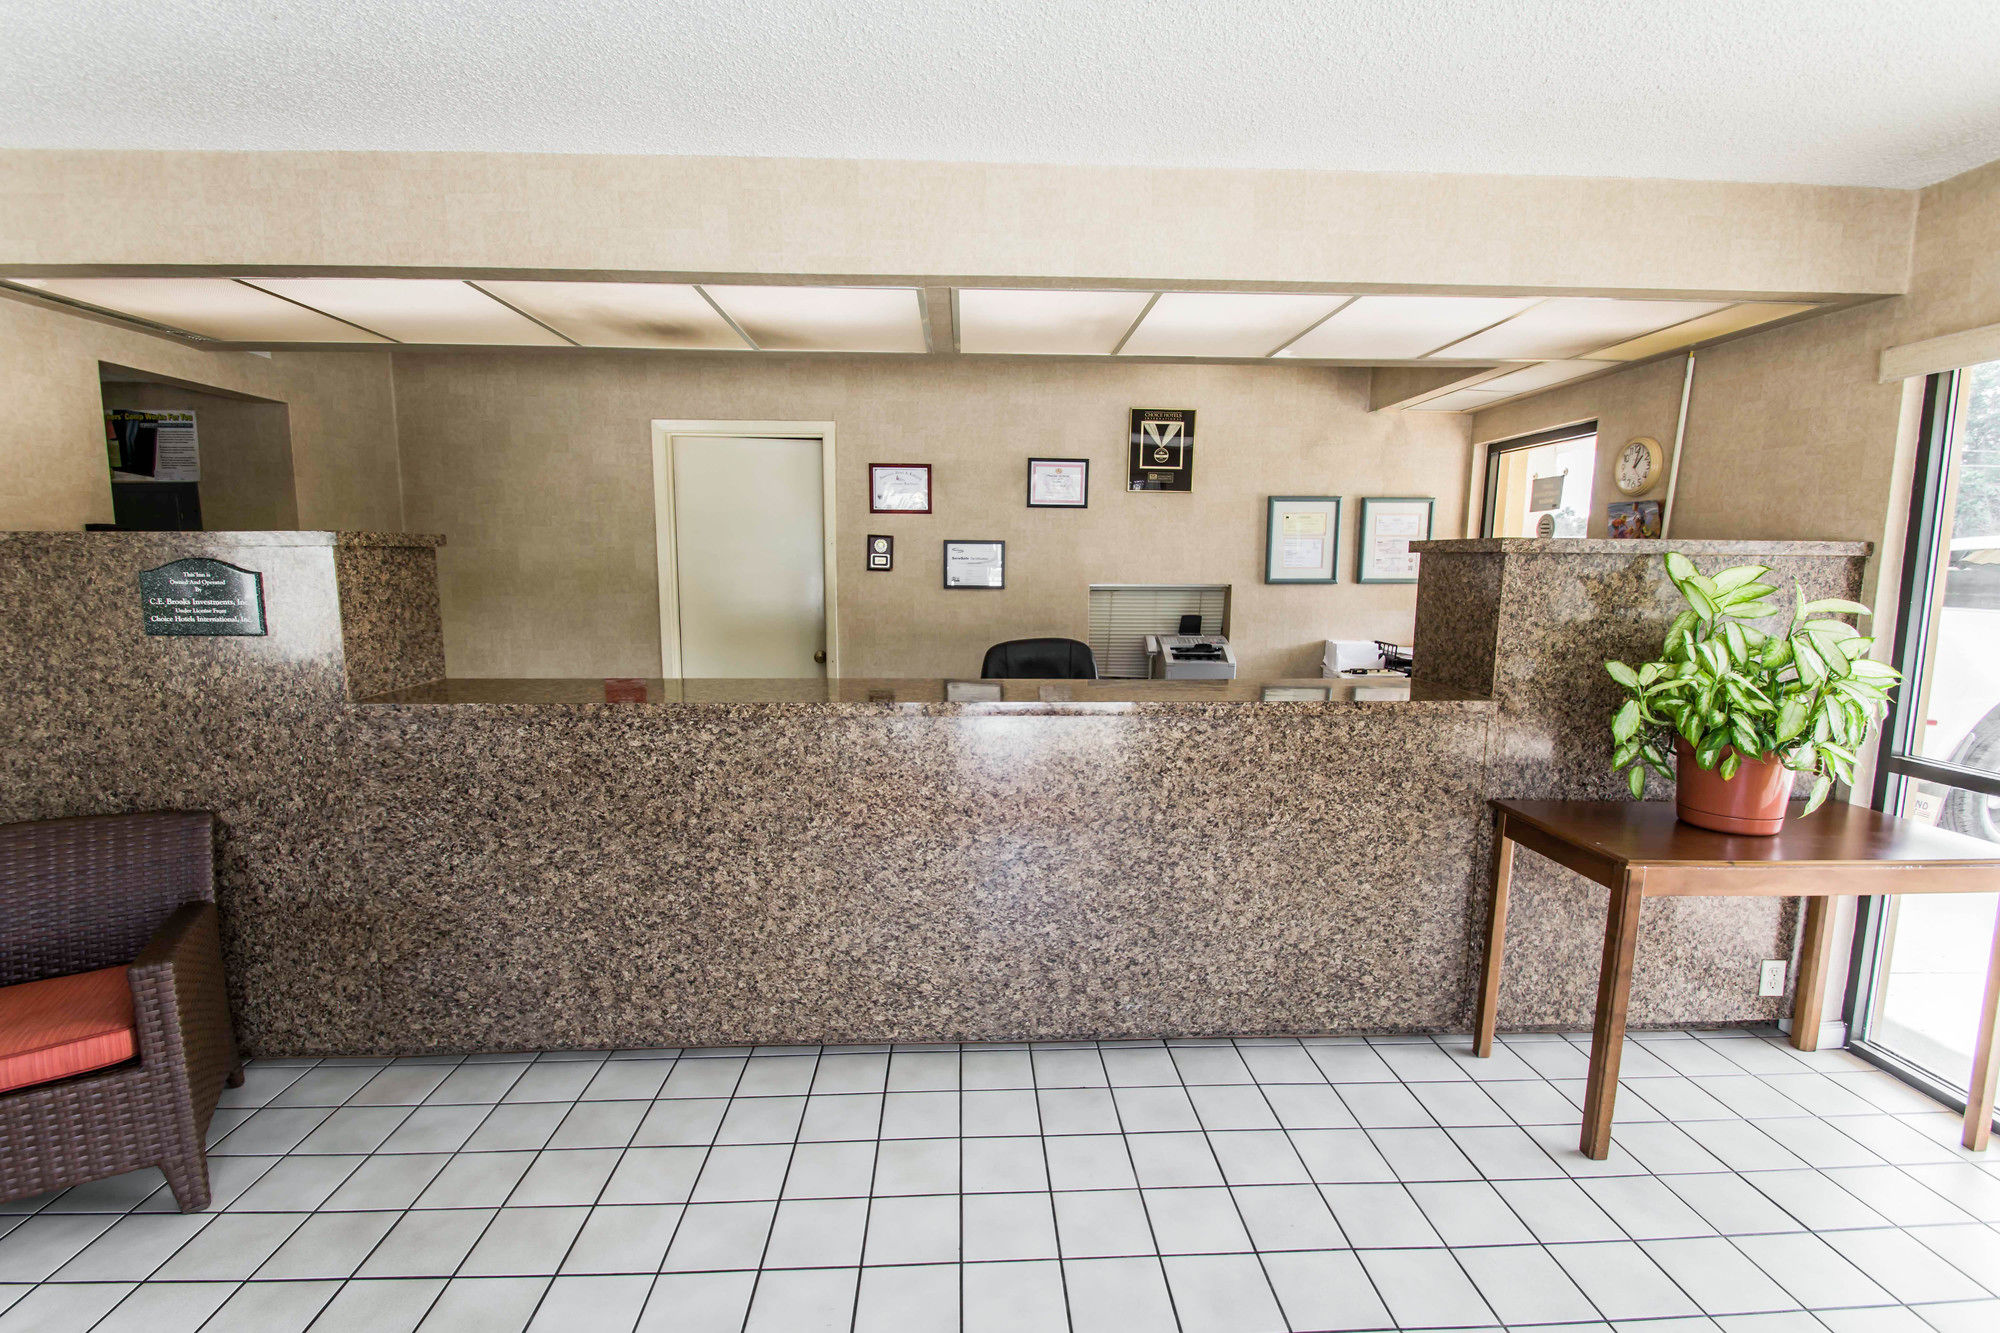 Econo Lodge - MacClenny in MacClenny, FL